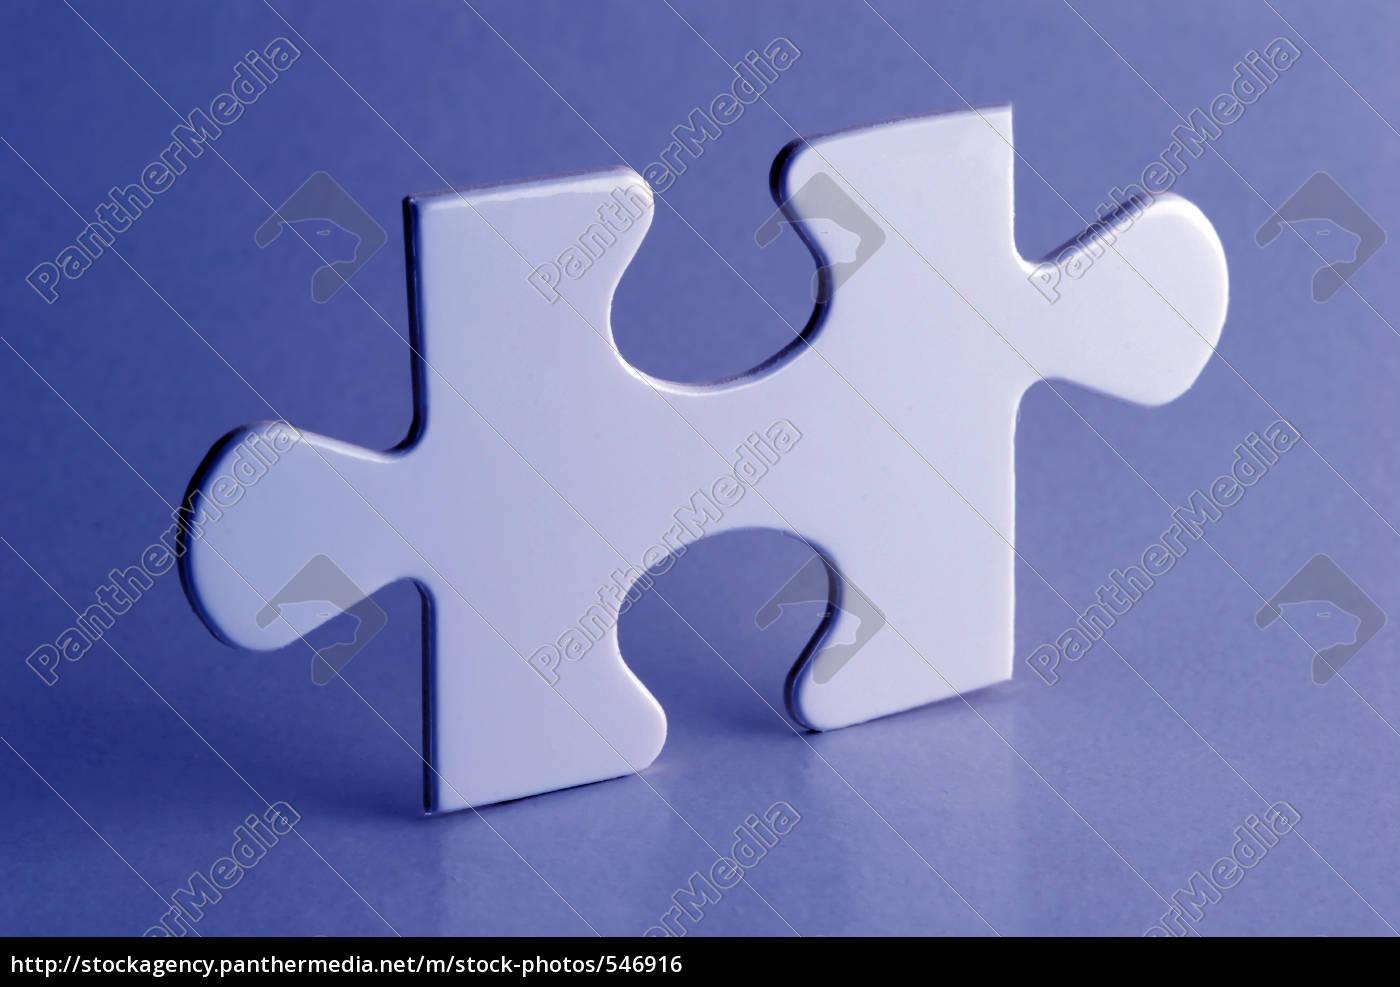 puzzle, icon, image - 546916